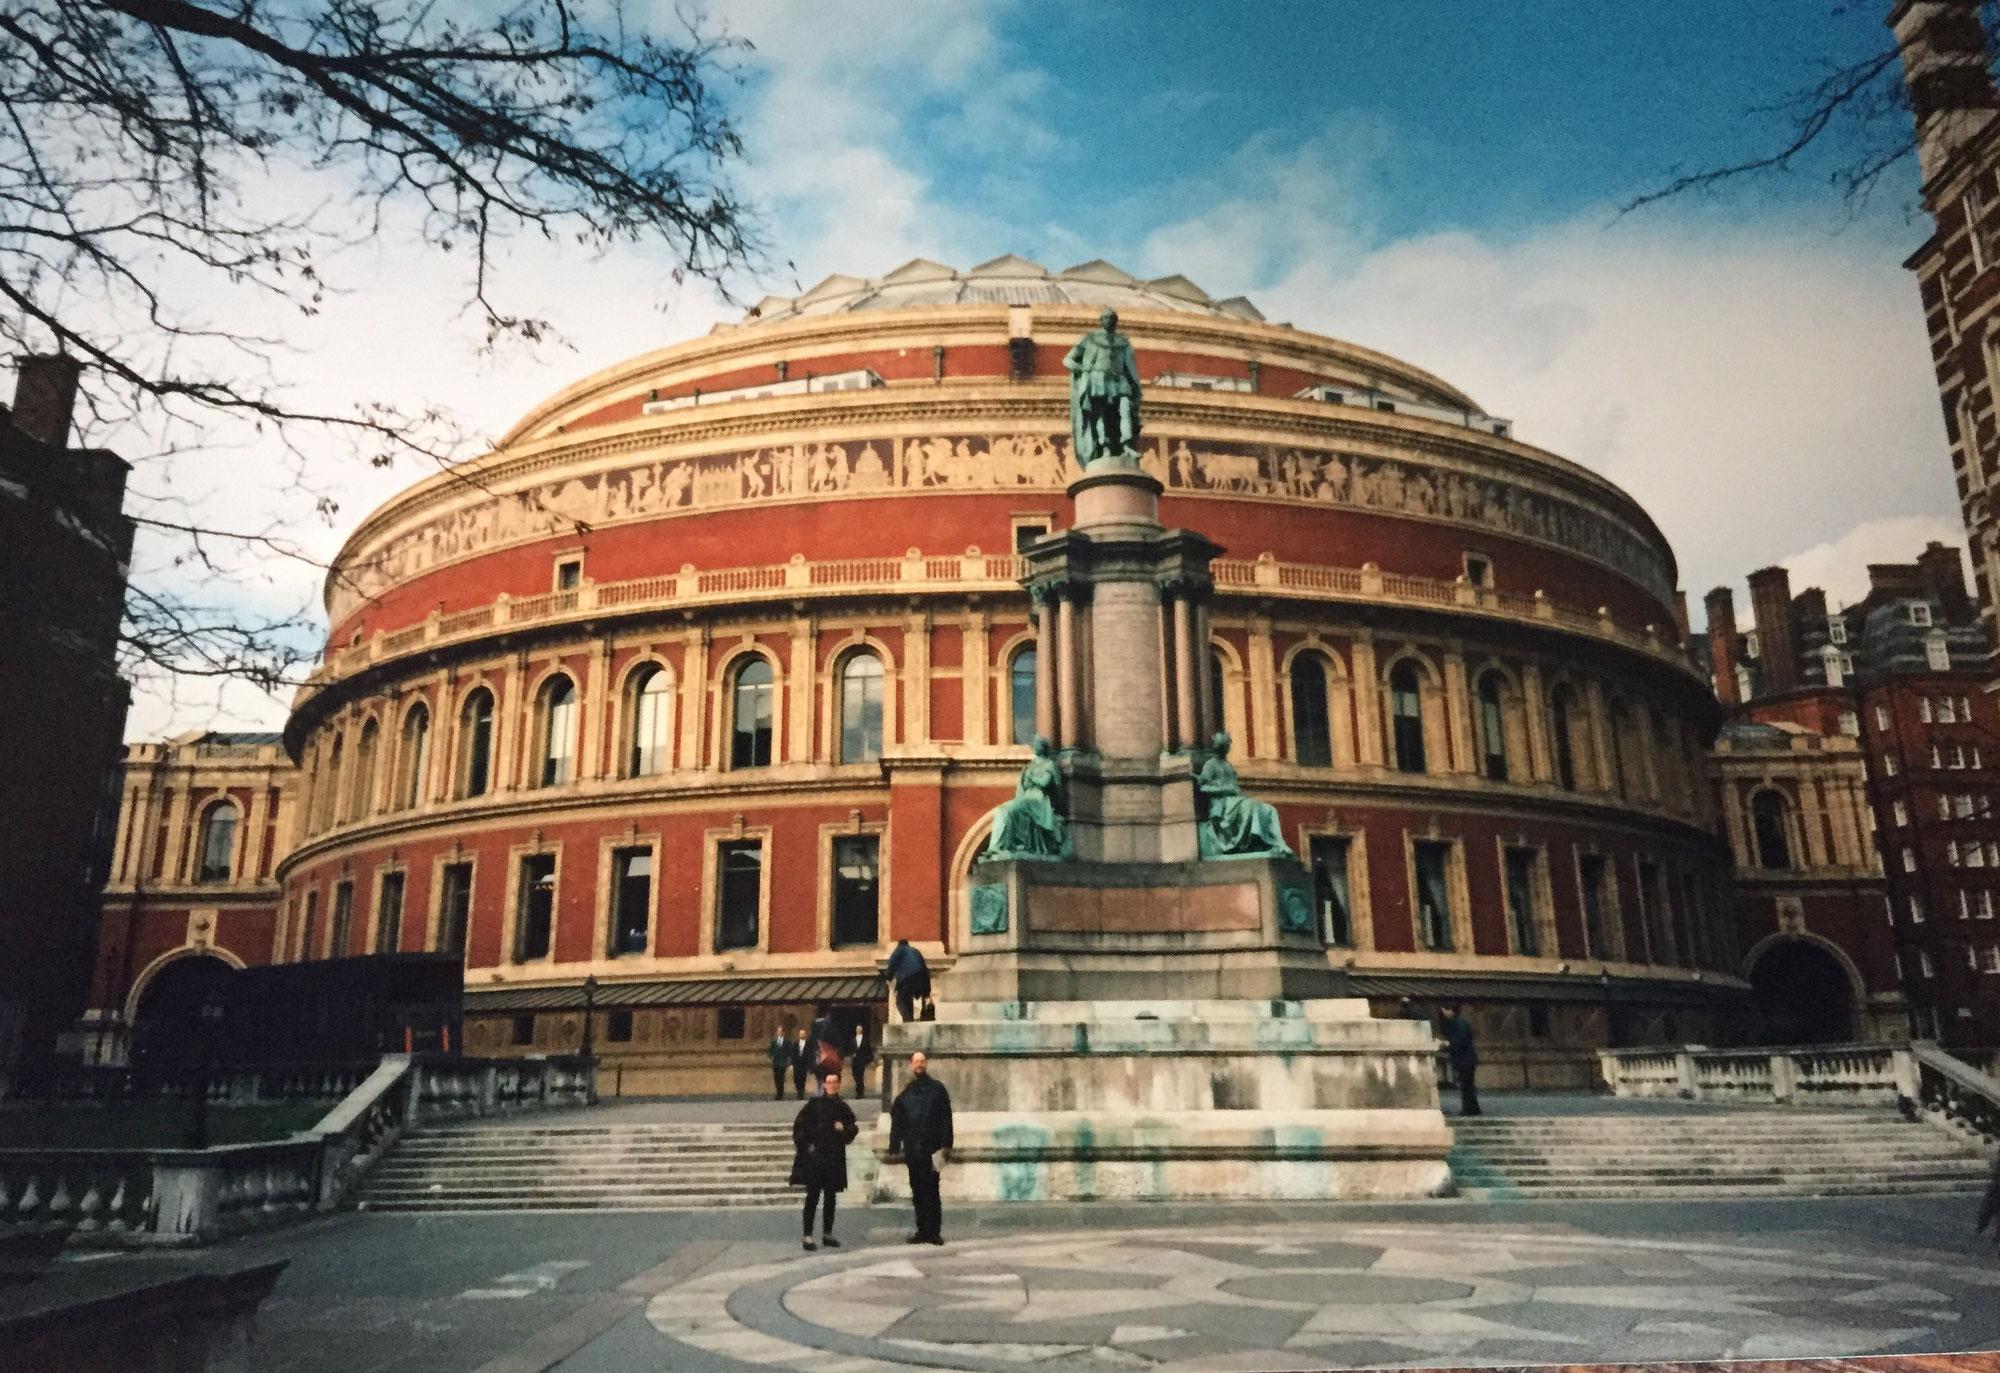 Concert at the Royal Albert Hall